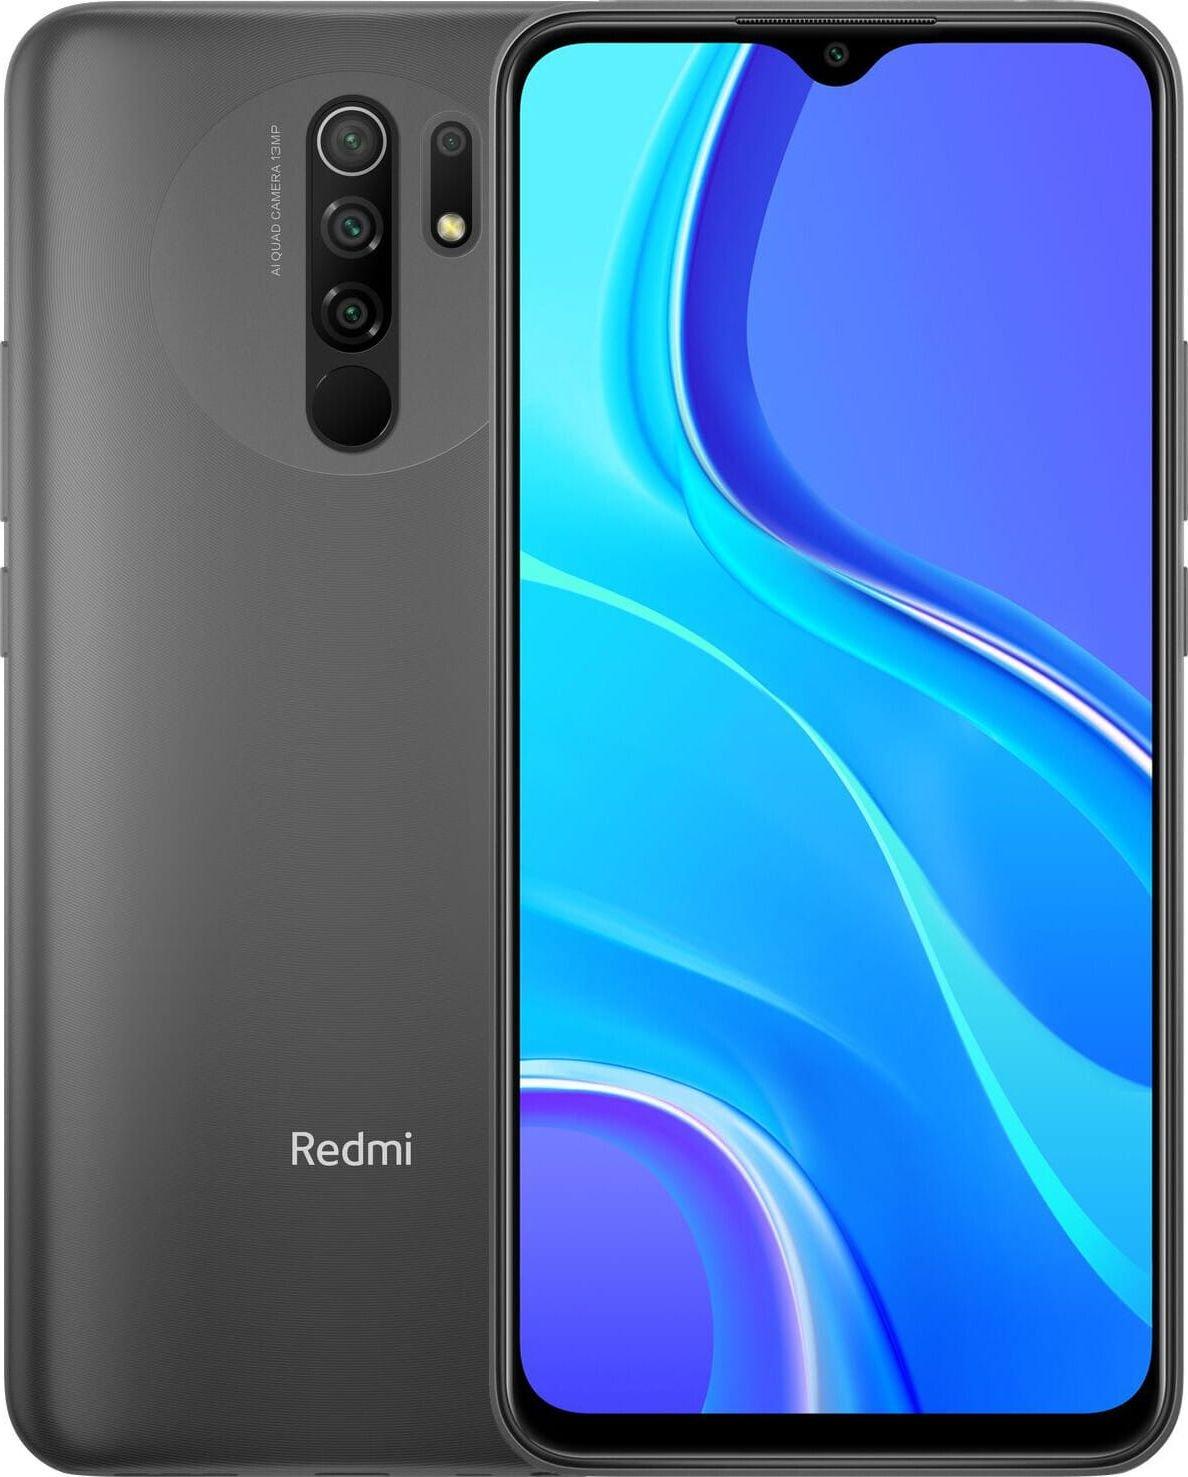 Smartfon Xiaomi Redmi 9 4/64GB Dual SIM Szary (28428) xiaomi_20200630162611 Mobilais Telefons